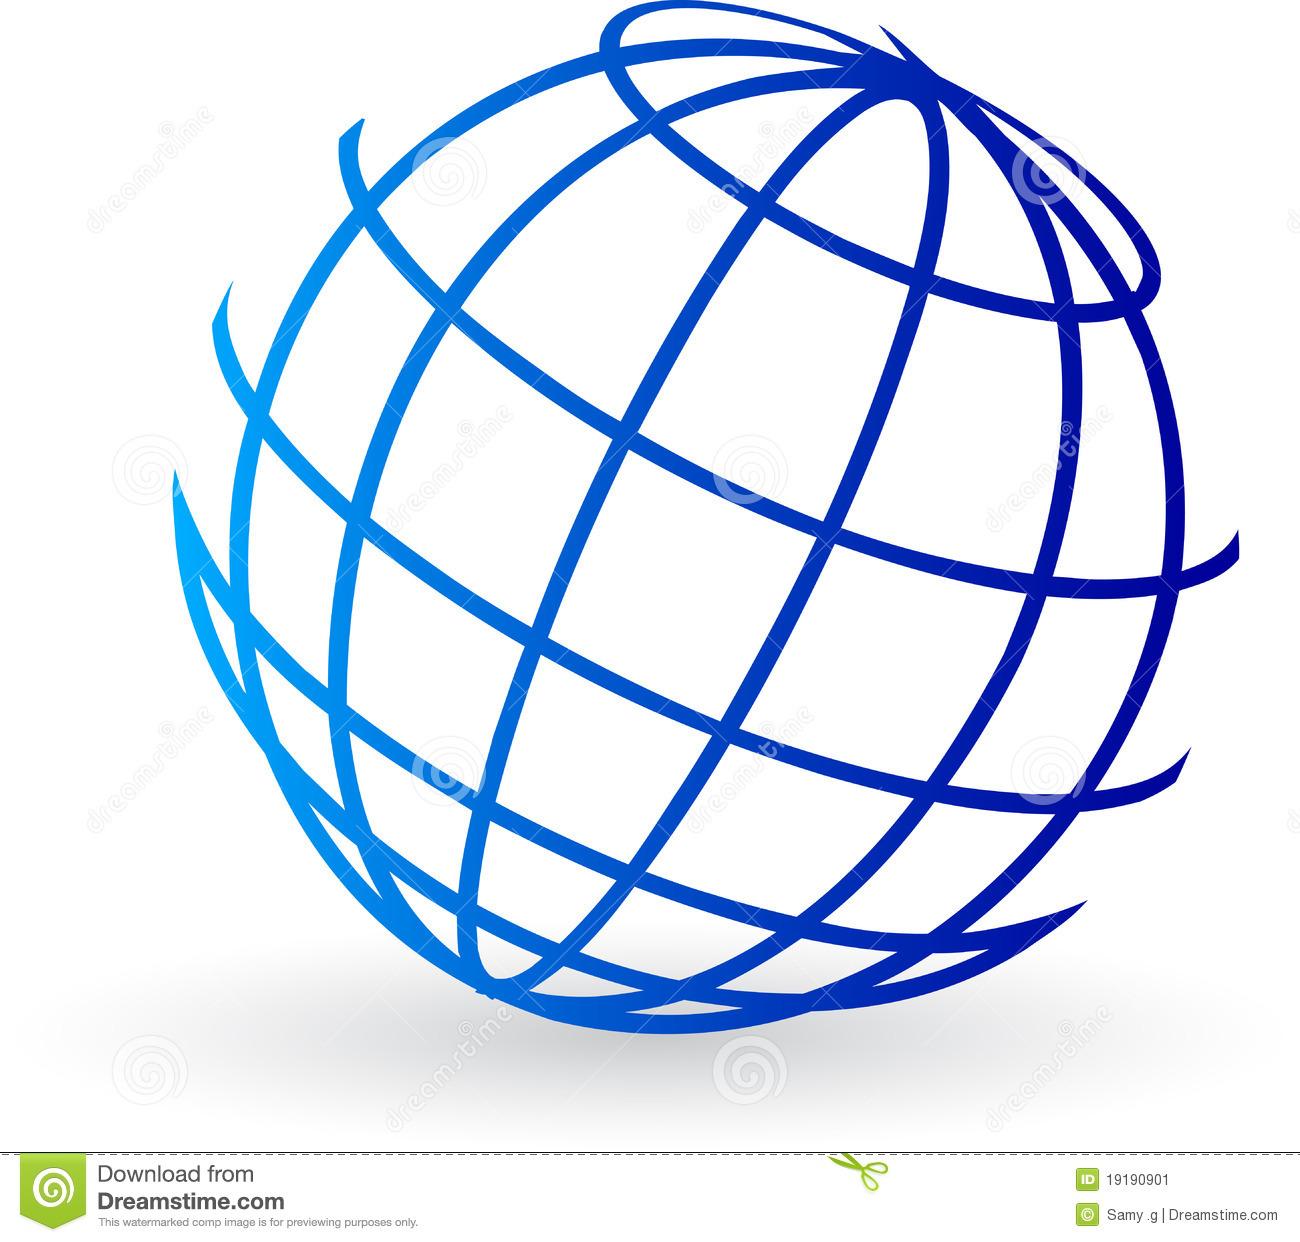 World clipart logo svg free Globe Outline Clipart | Free download best Globe Outline Clipart on ... svg free